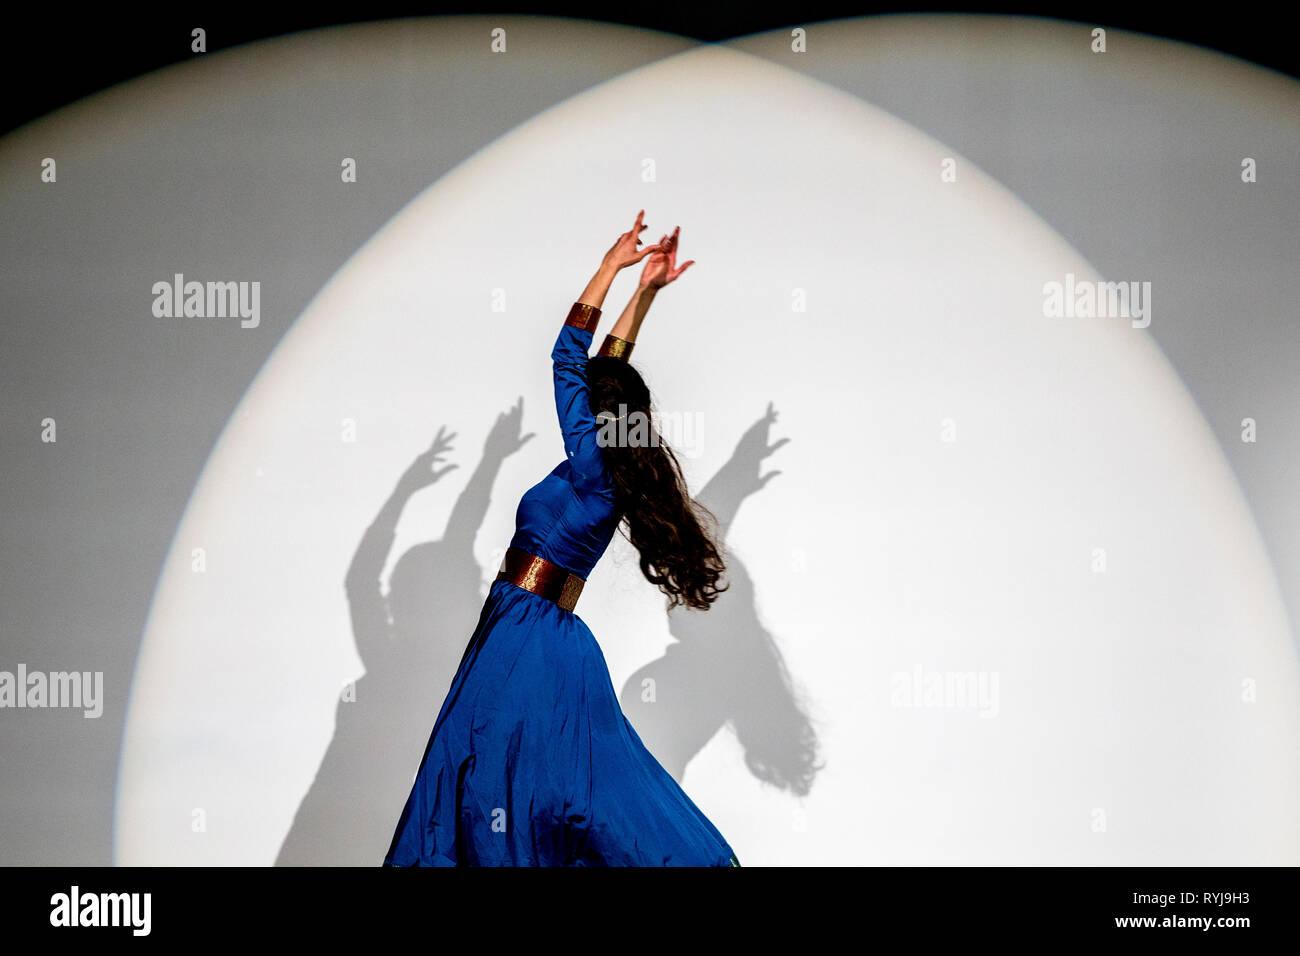 Dancer performing in Paris, France. - Stock Image